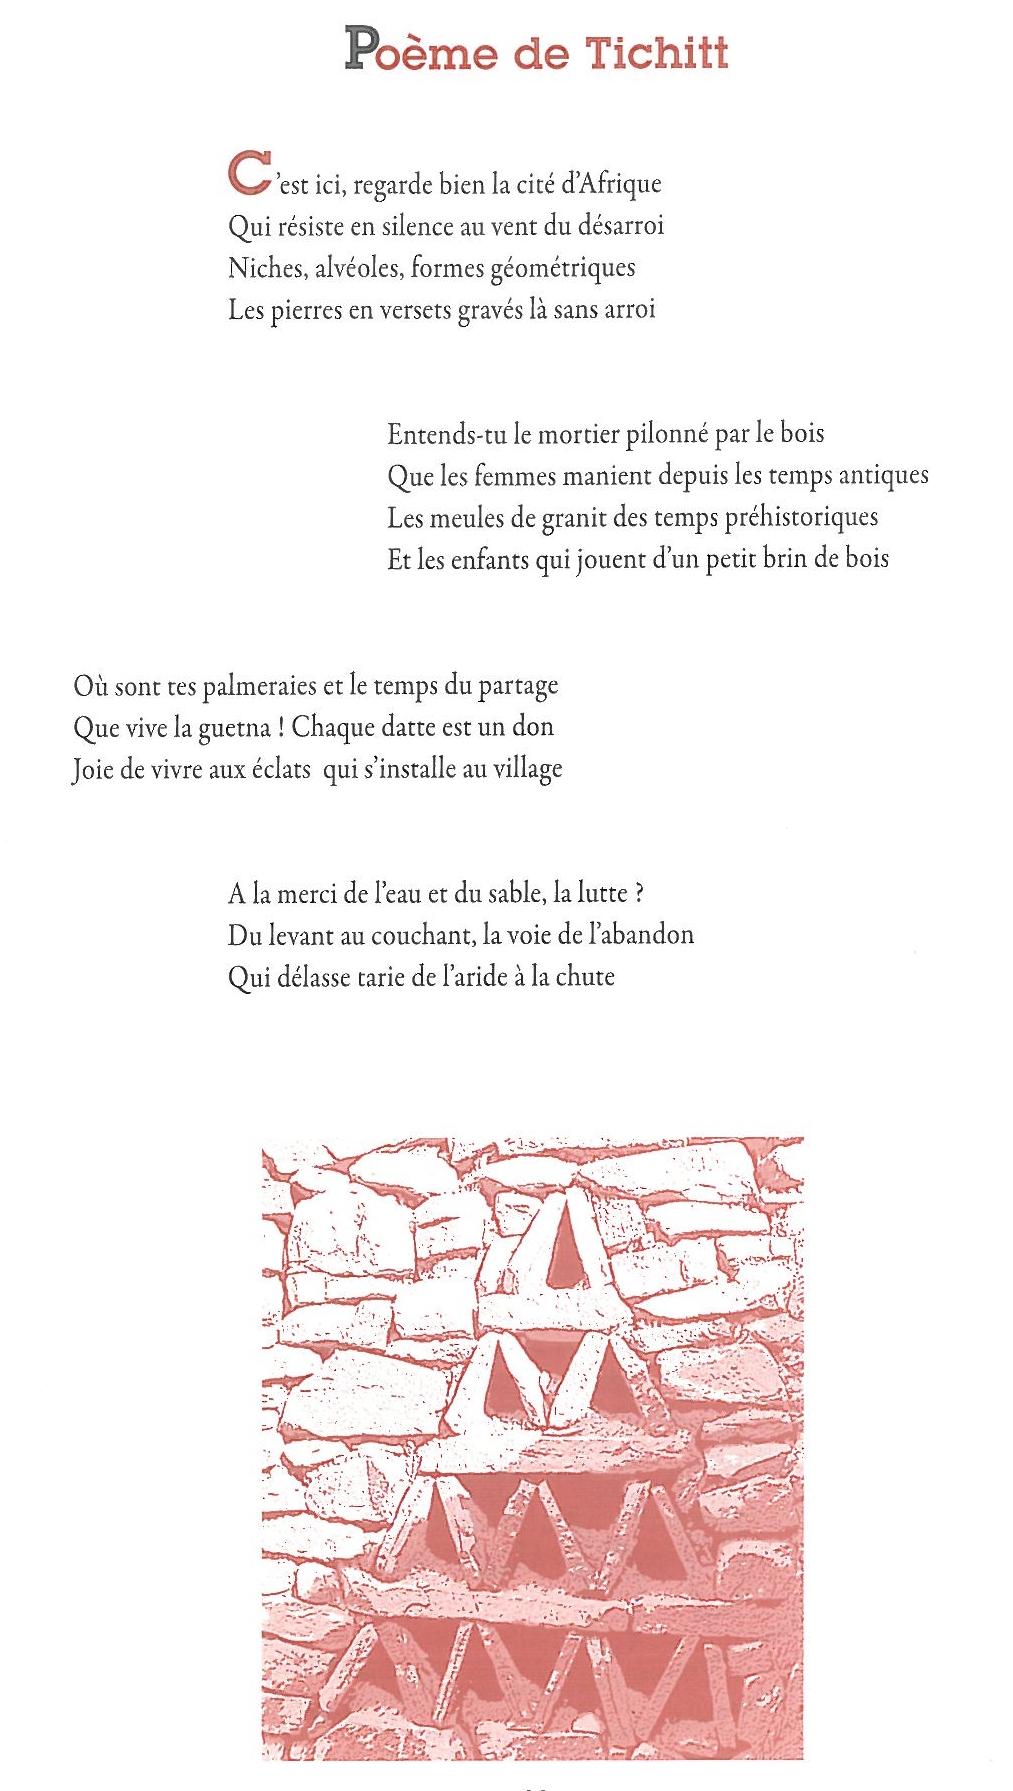 Poème de Tichitt